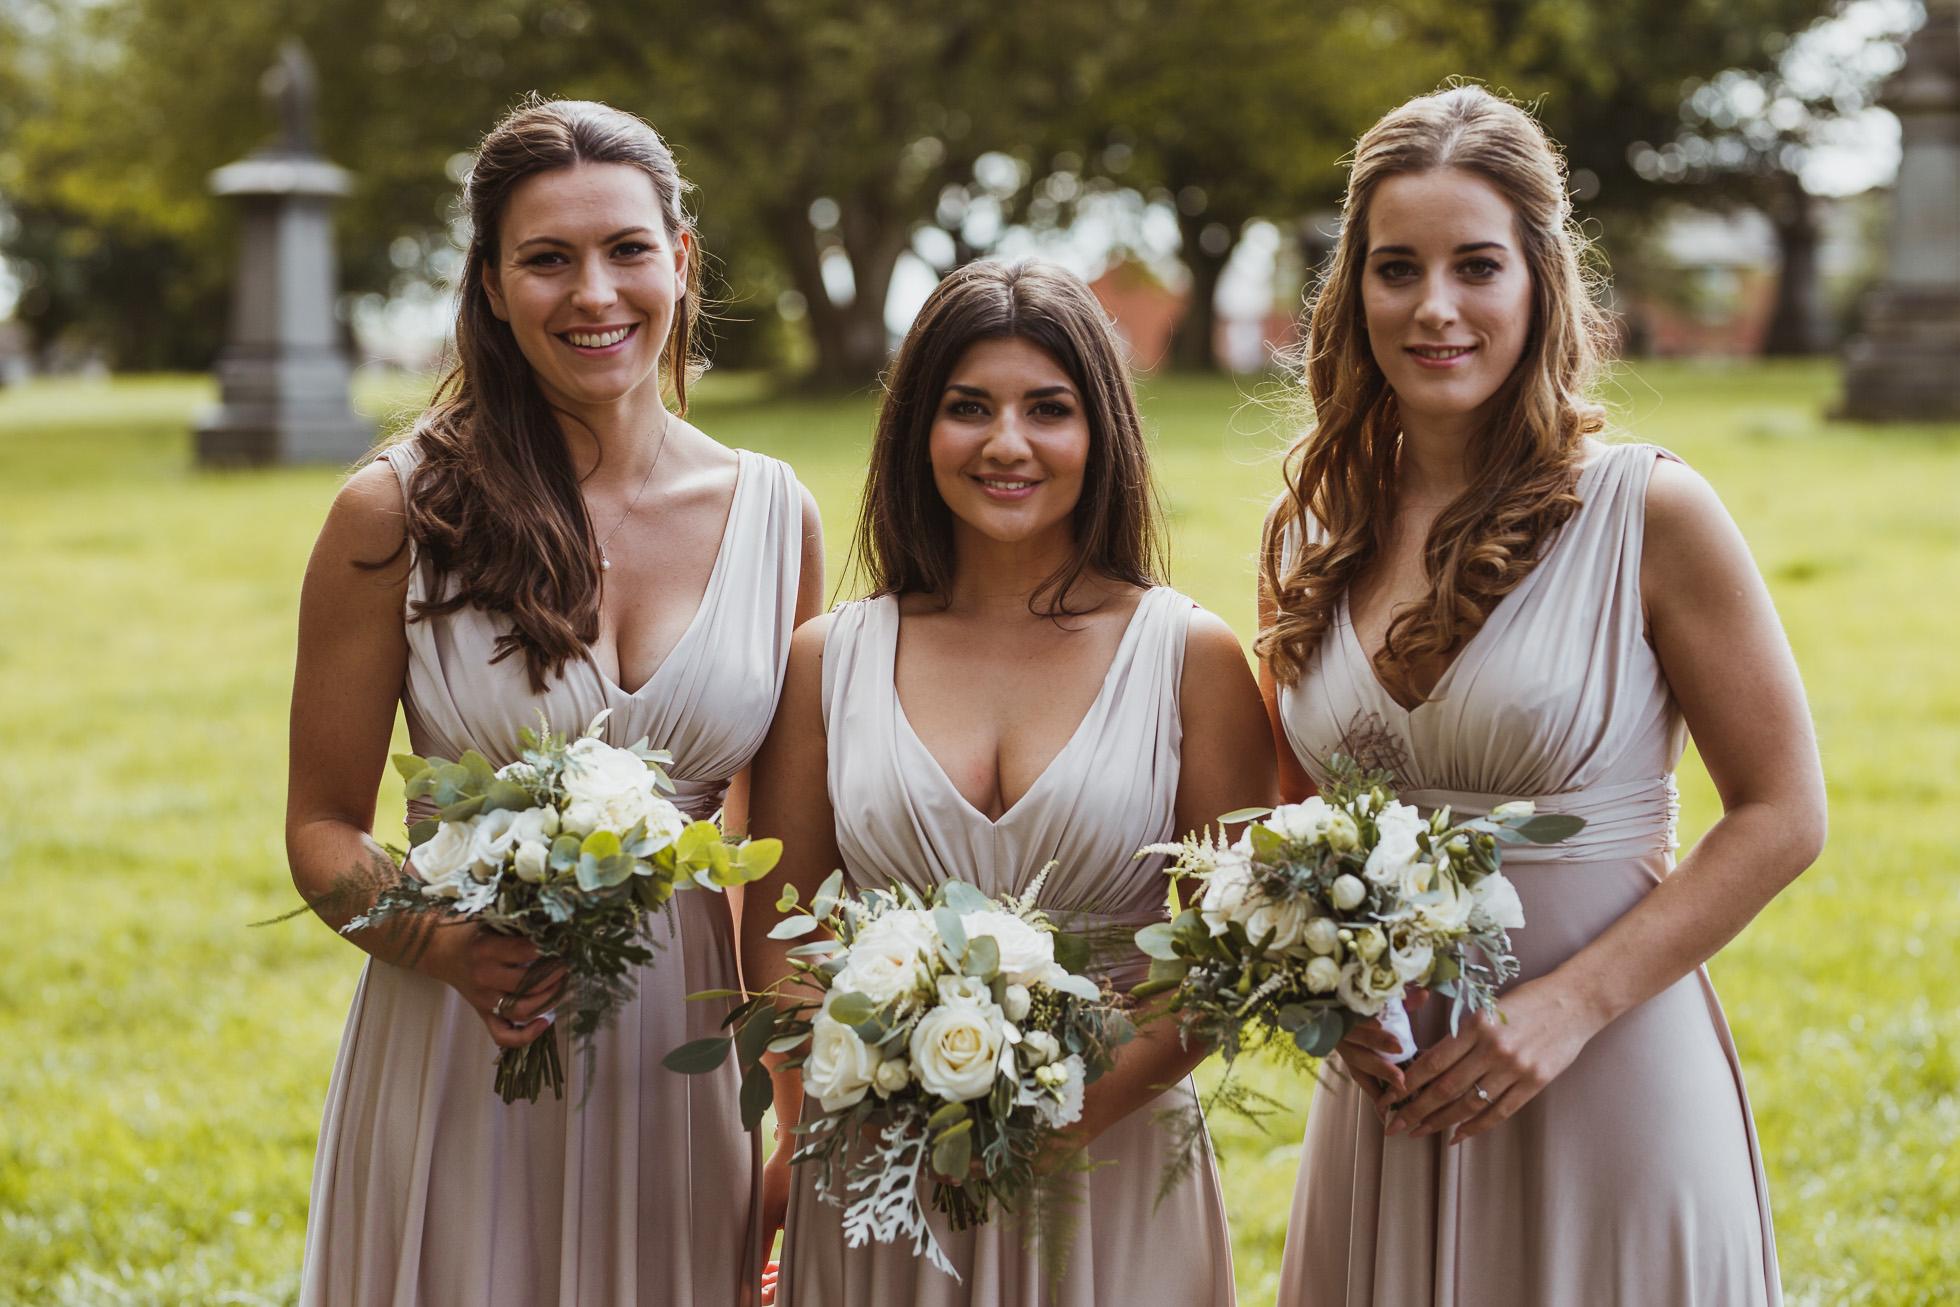 woodman_inn_thunderbridge_wedding_photographer-45.jpg